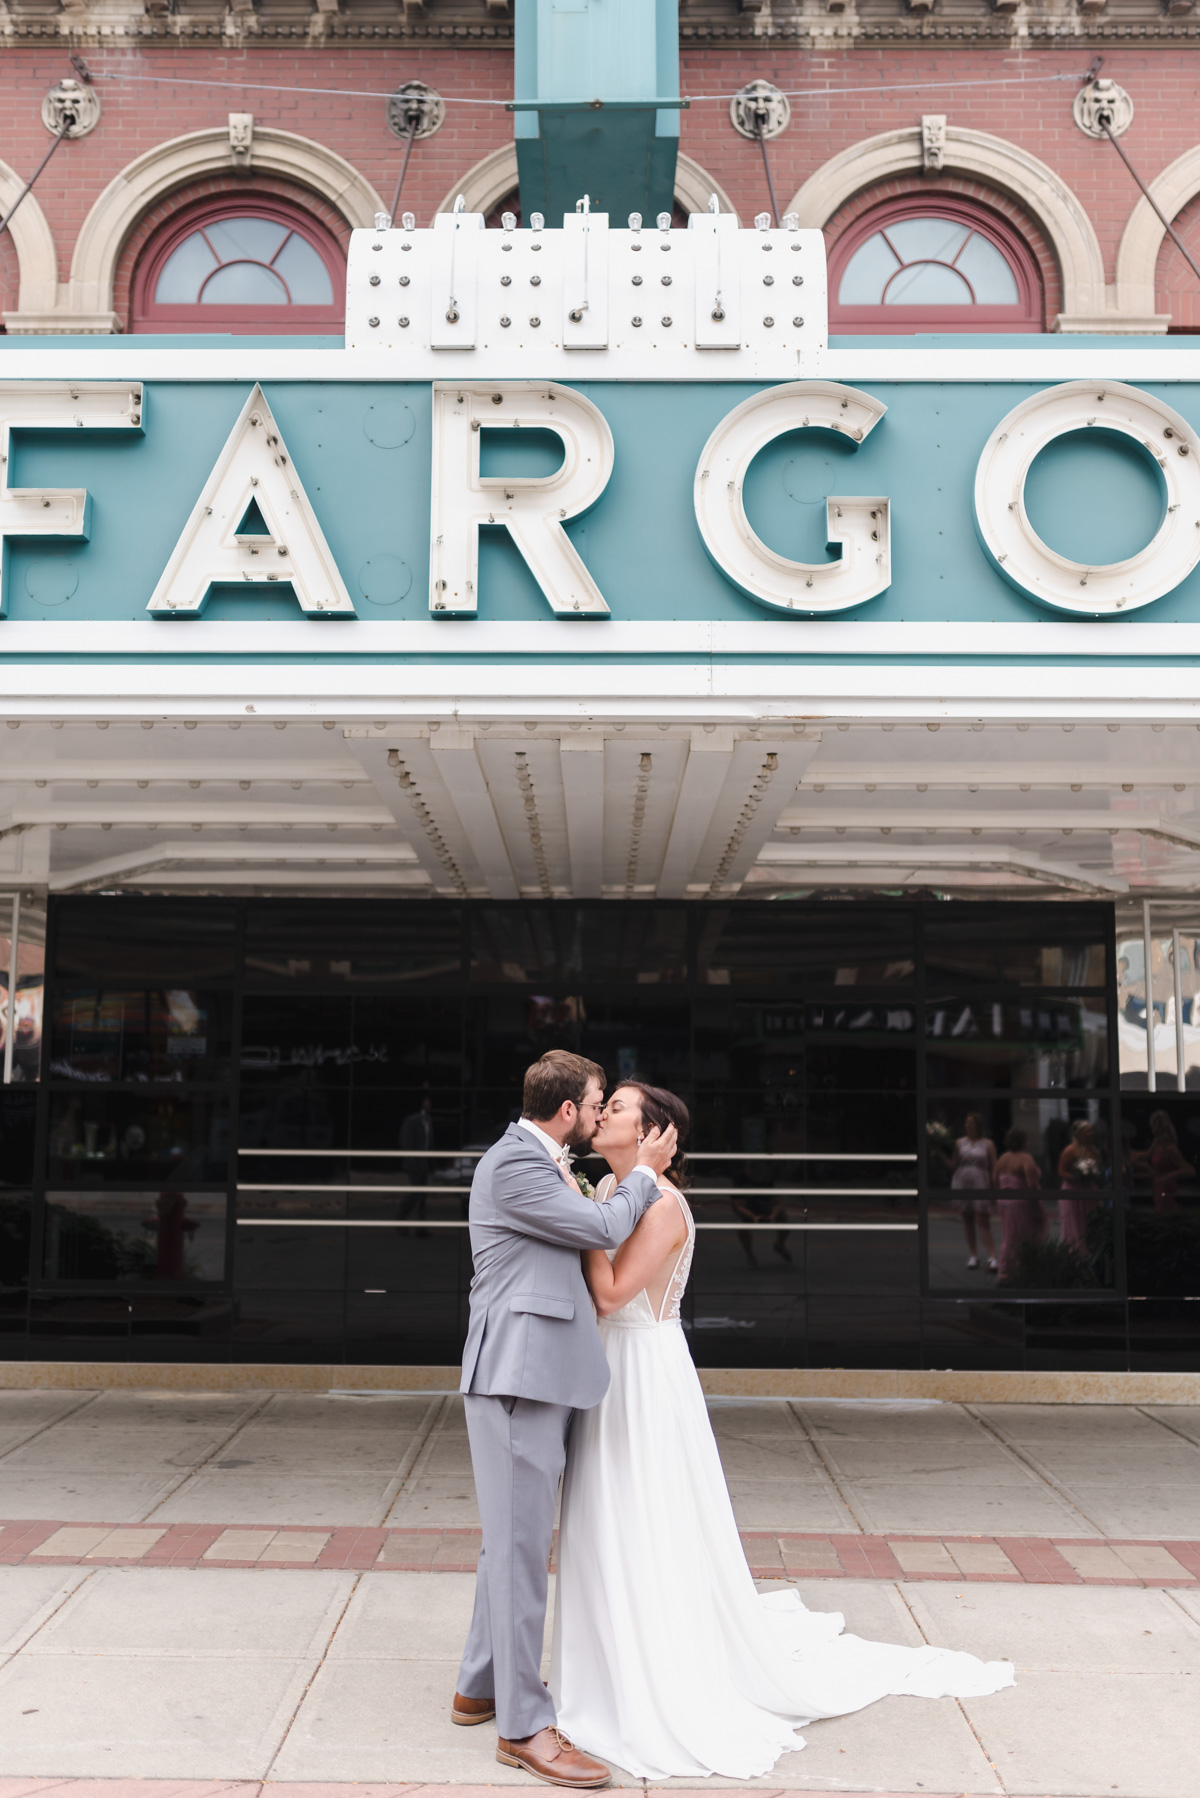 Downtown Fargo Wedding   Fargo ND Wedding Photographer